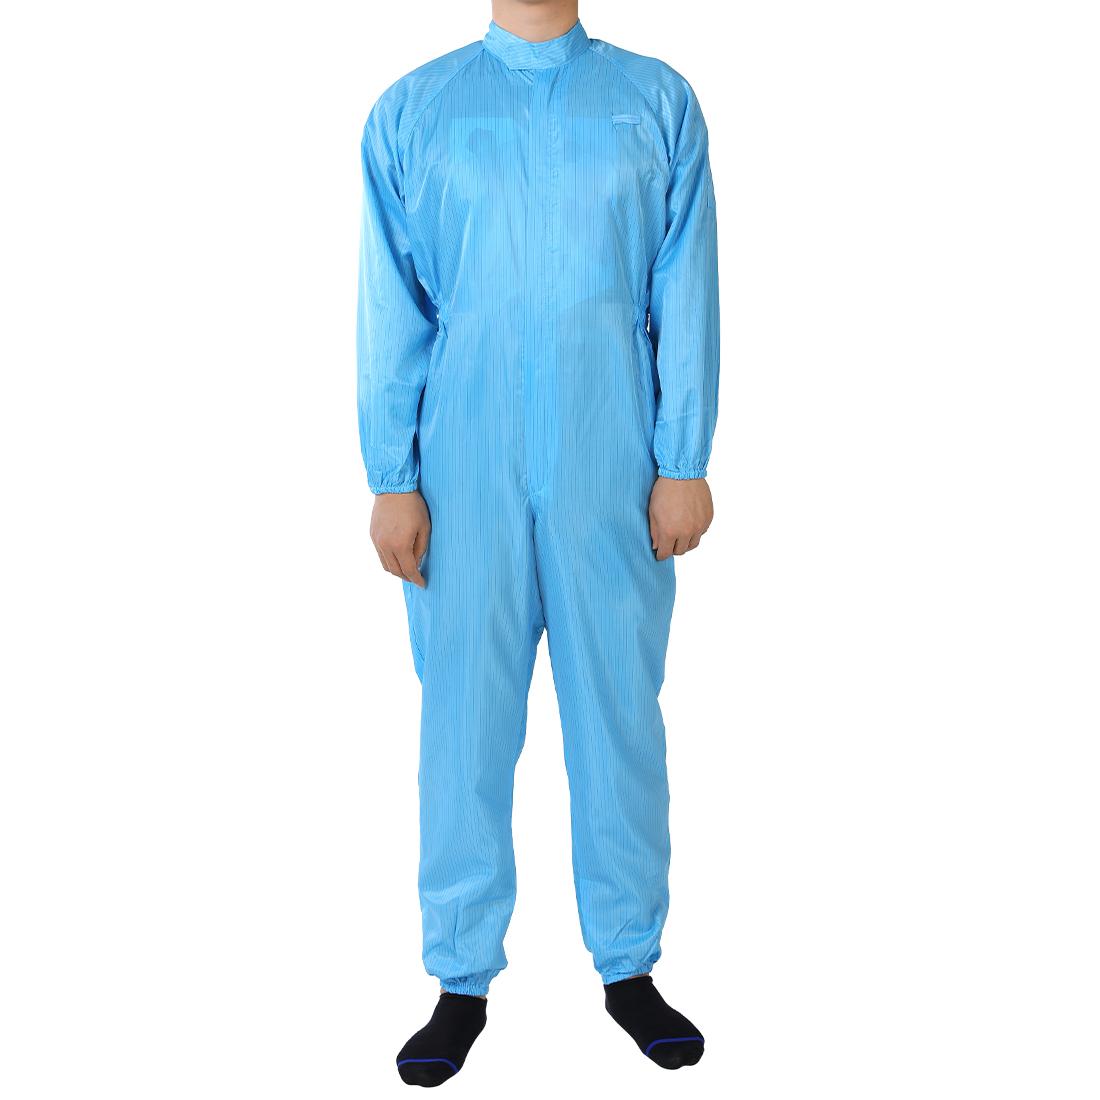 Anti Static Overalls Siamese Unisex ESD Lab Coat Stripes Button Up S Blue